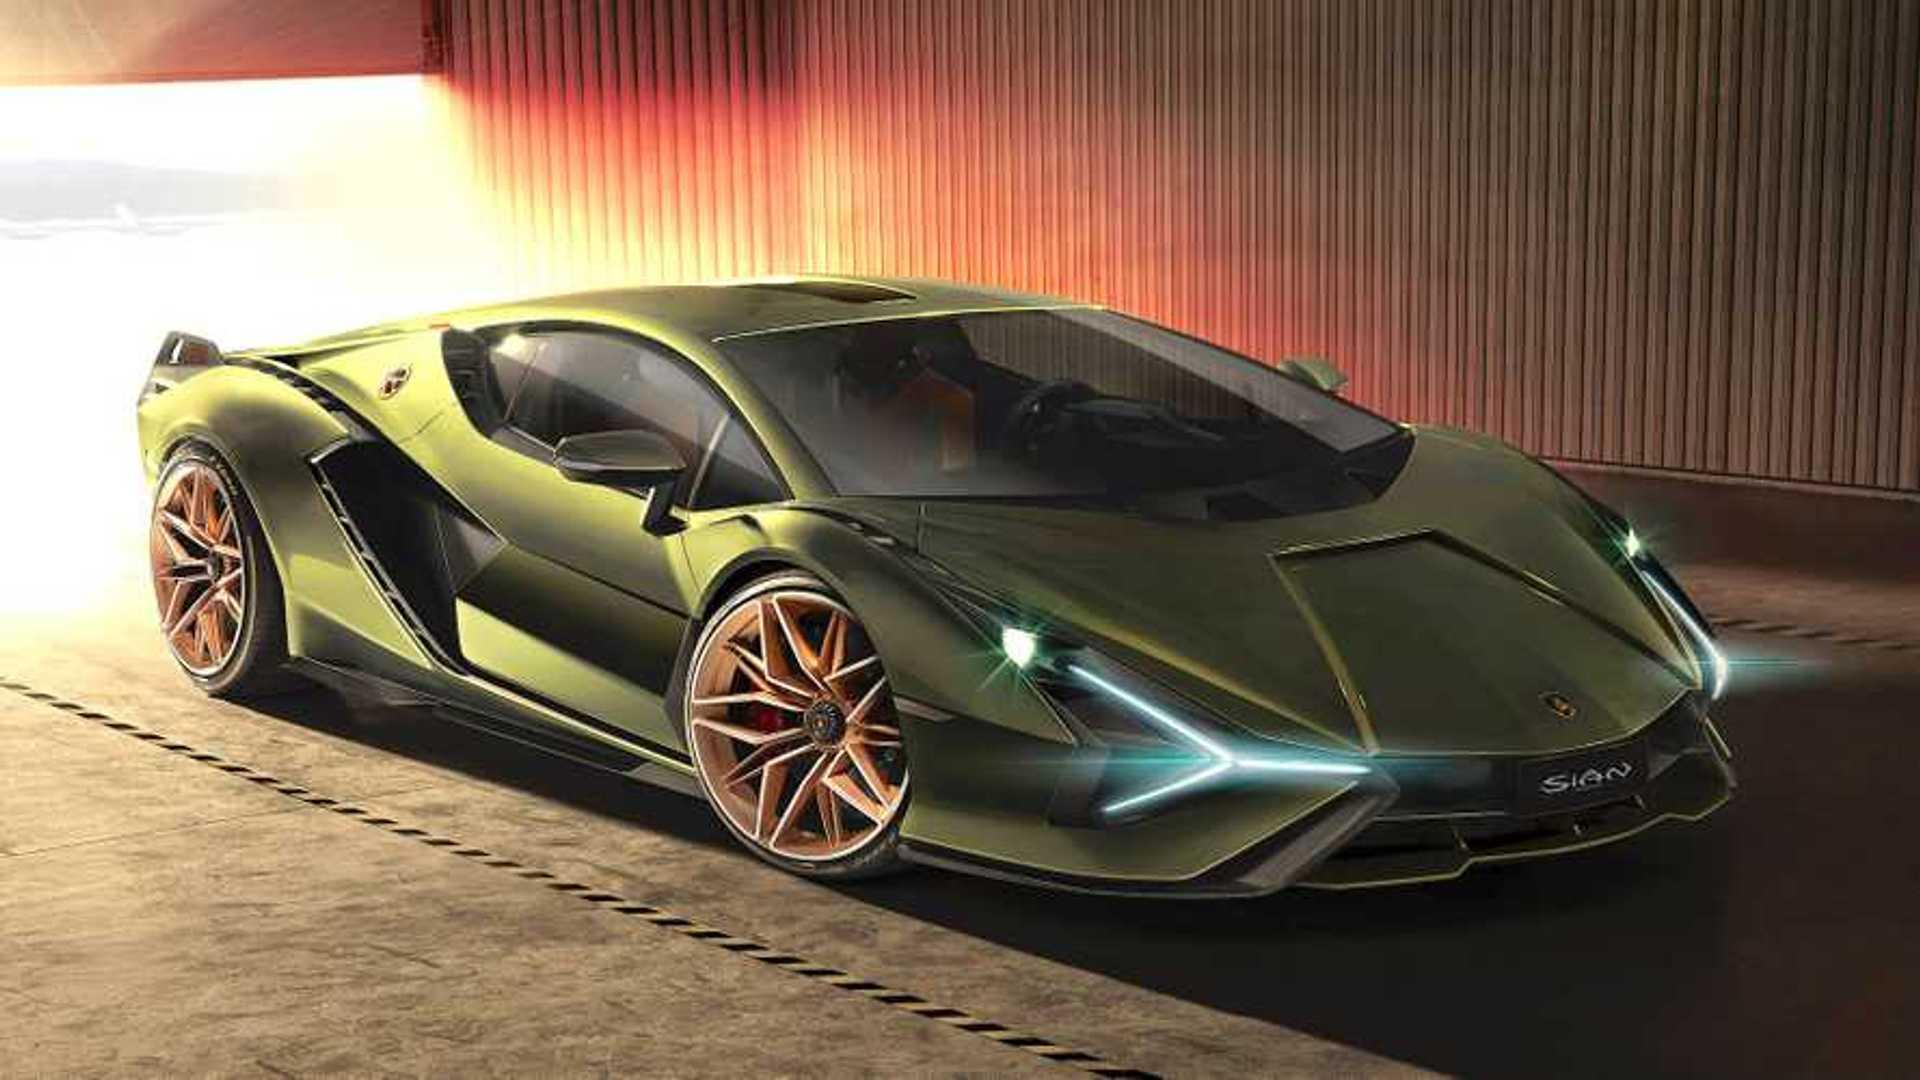 Lamborghini To Skip 2020 Geneva Motor Show; Hybrids Planned